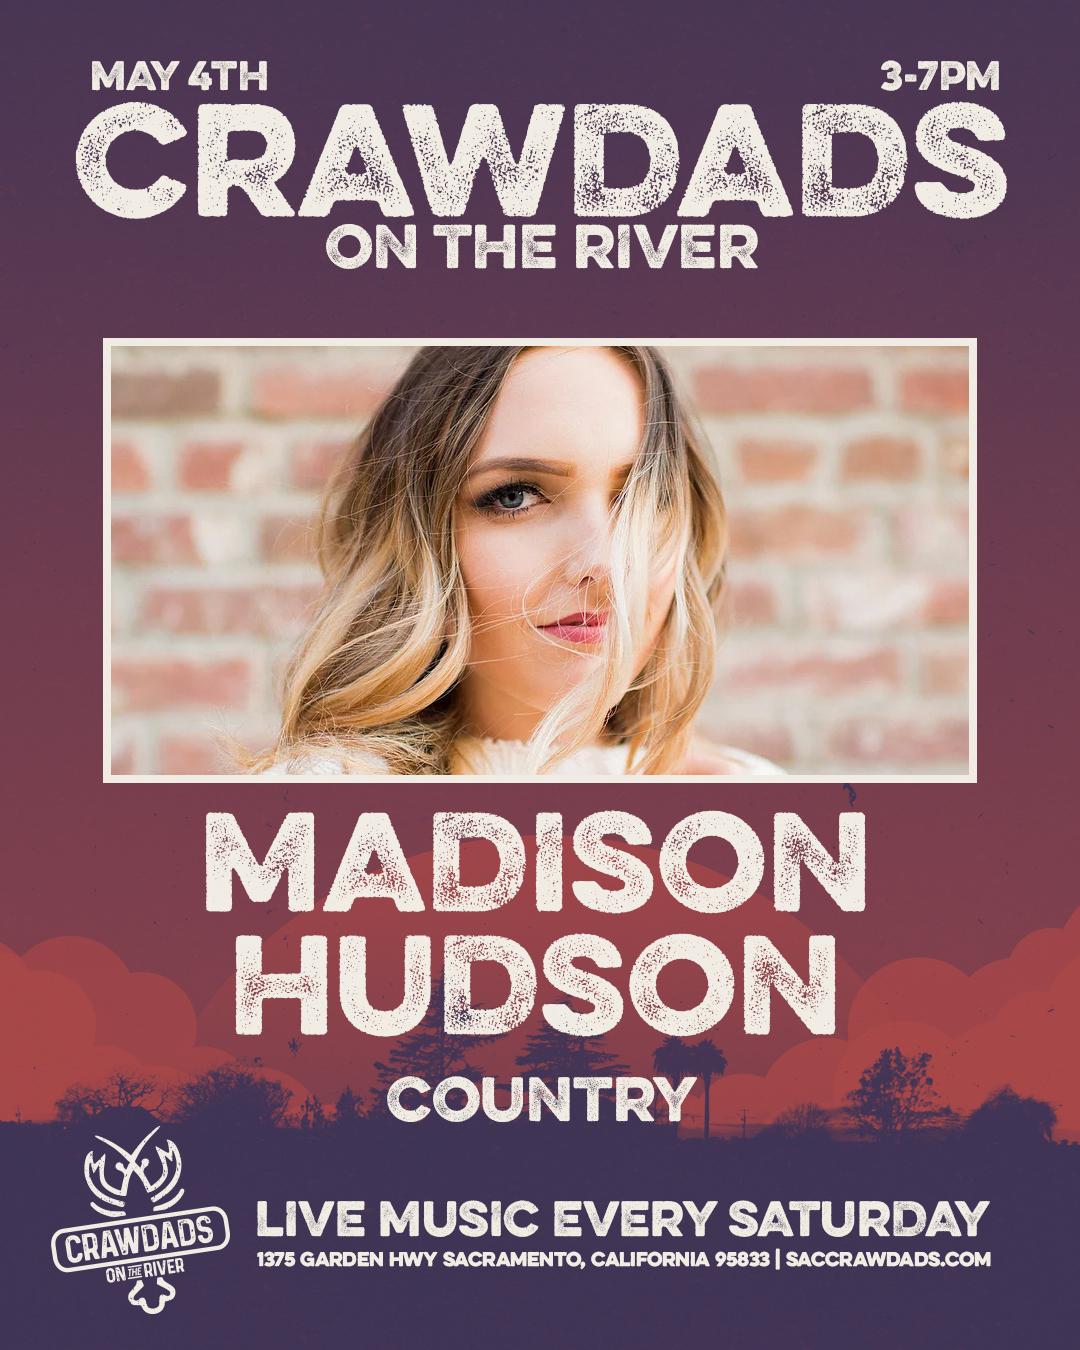 Madison Hudson